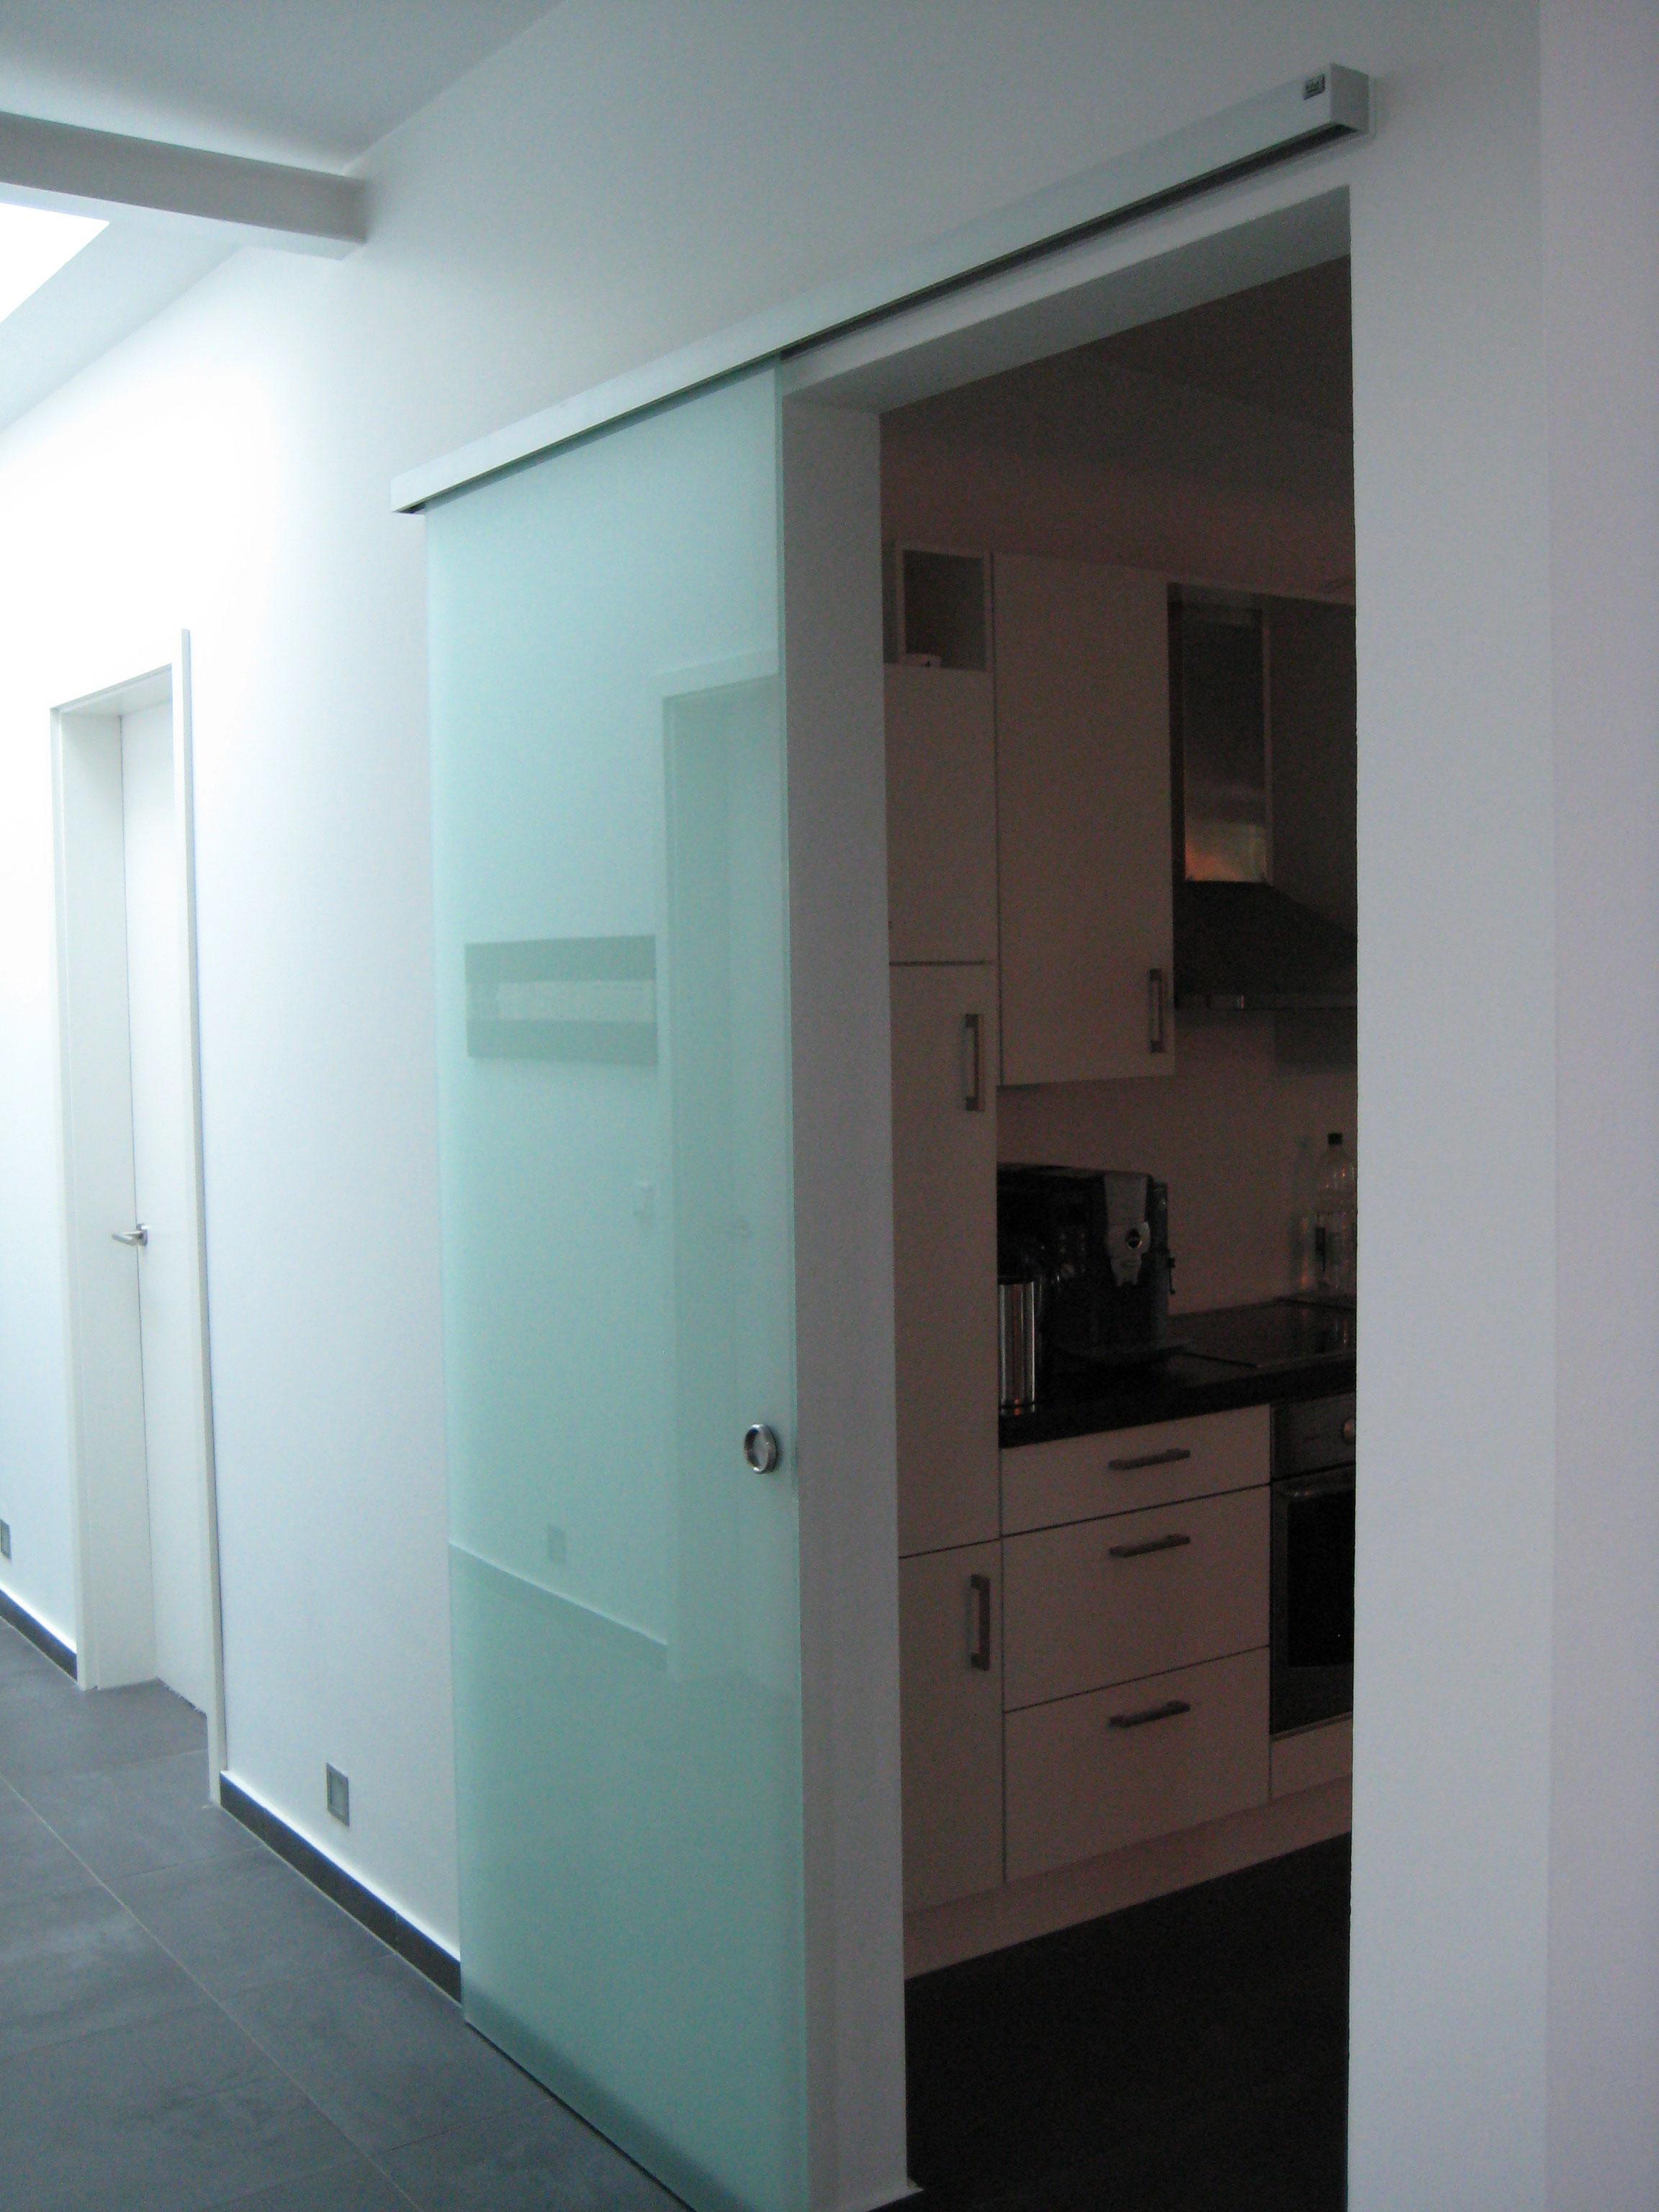 innent ren zimmert ren glast ren glasschiebet ren schiebet ren rheda wiedenbr ck dietmar sasse. Black Bedroom Furniture Sets. Home Design Ideas